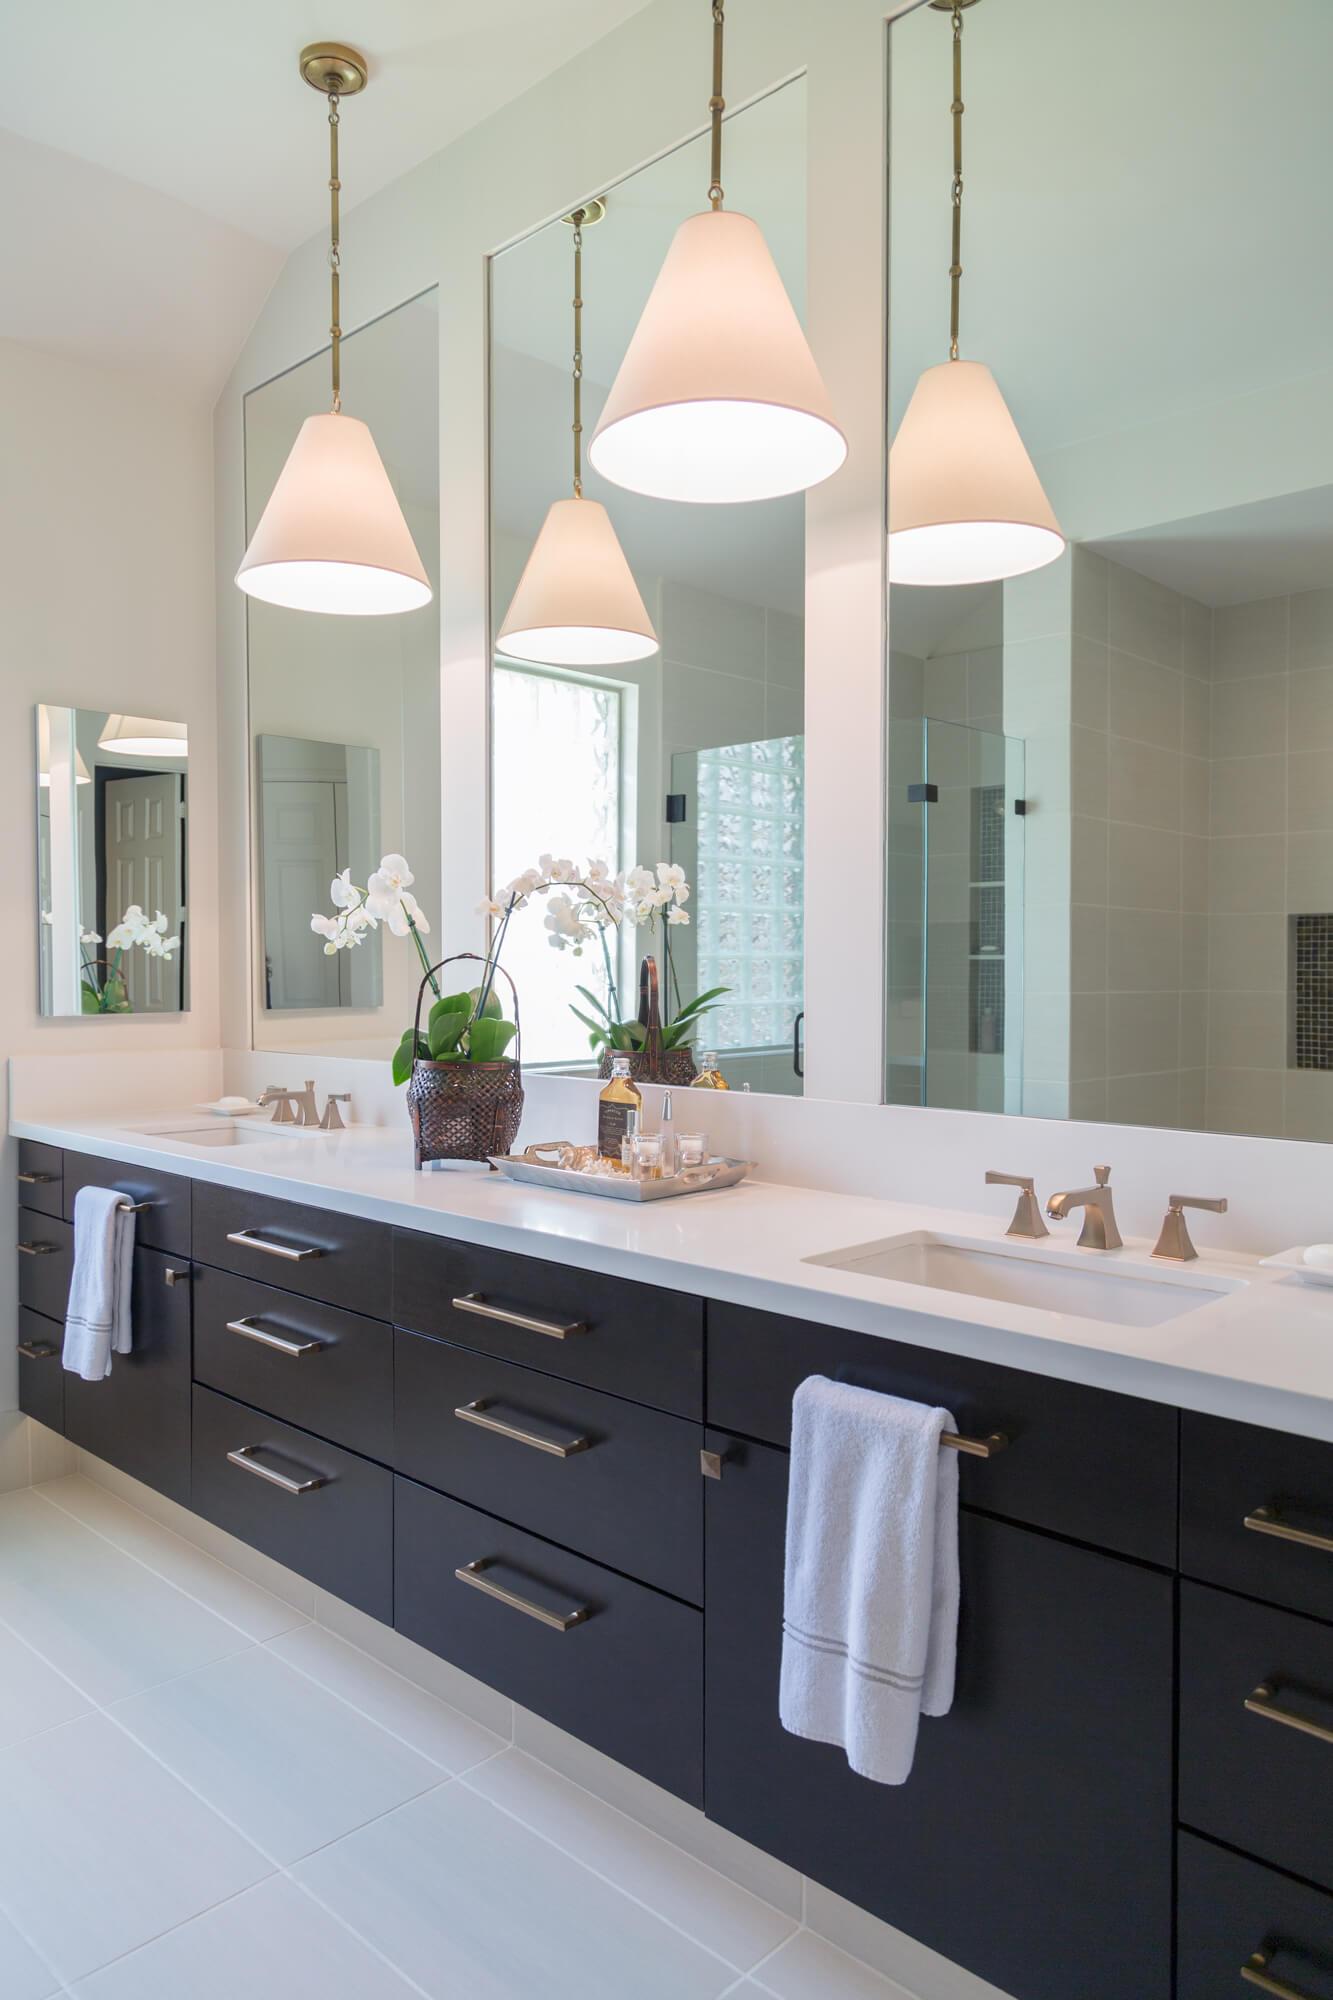 Pendant lights were used in this bathroom remodel. Carla Aston, Designer | Tori Aston, Photographer #pendantlight #bathroomlighting #bathroomdesign